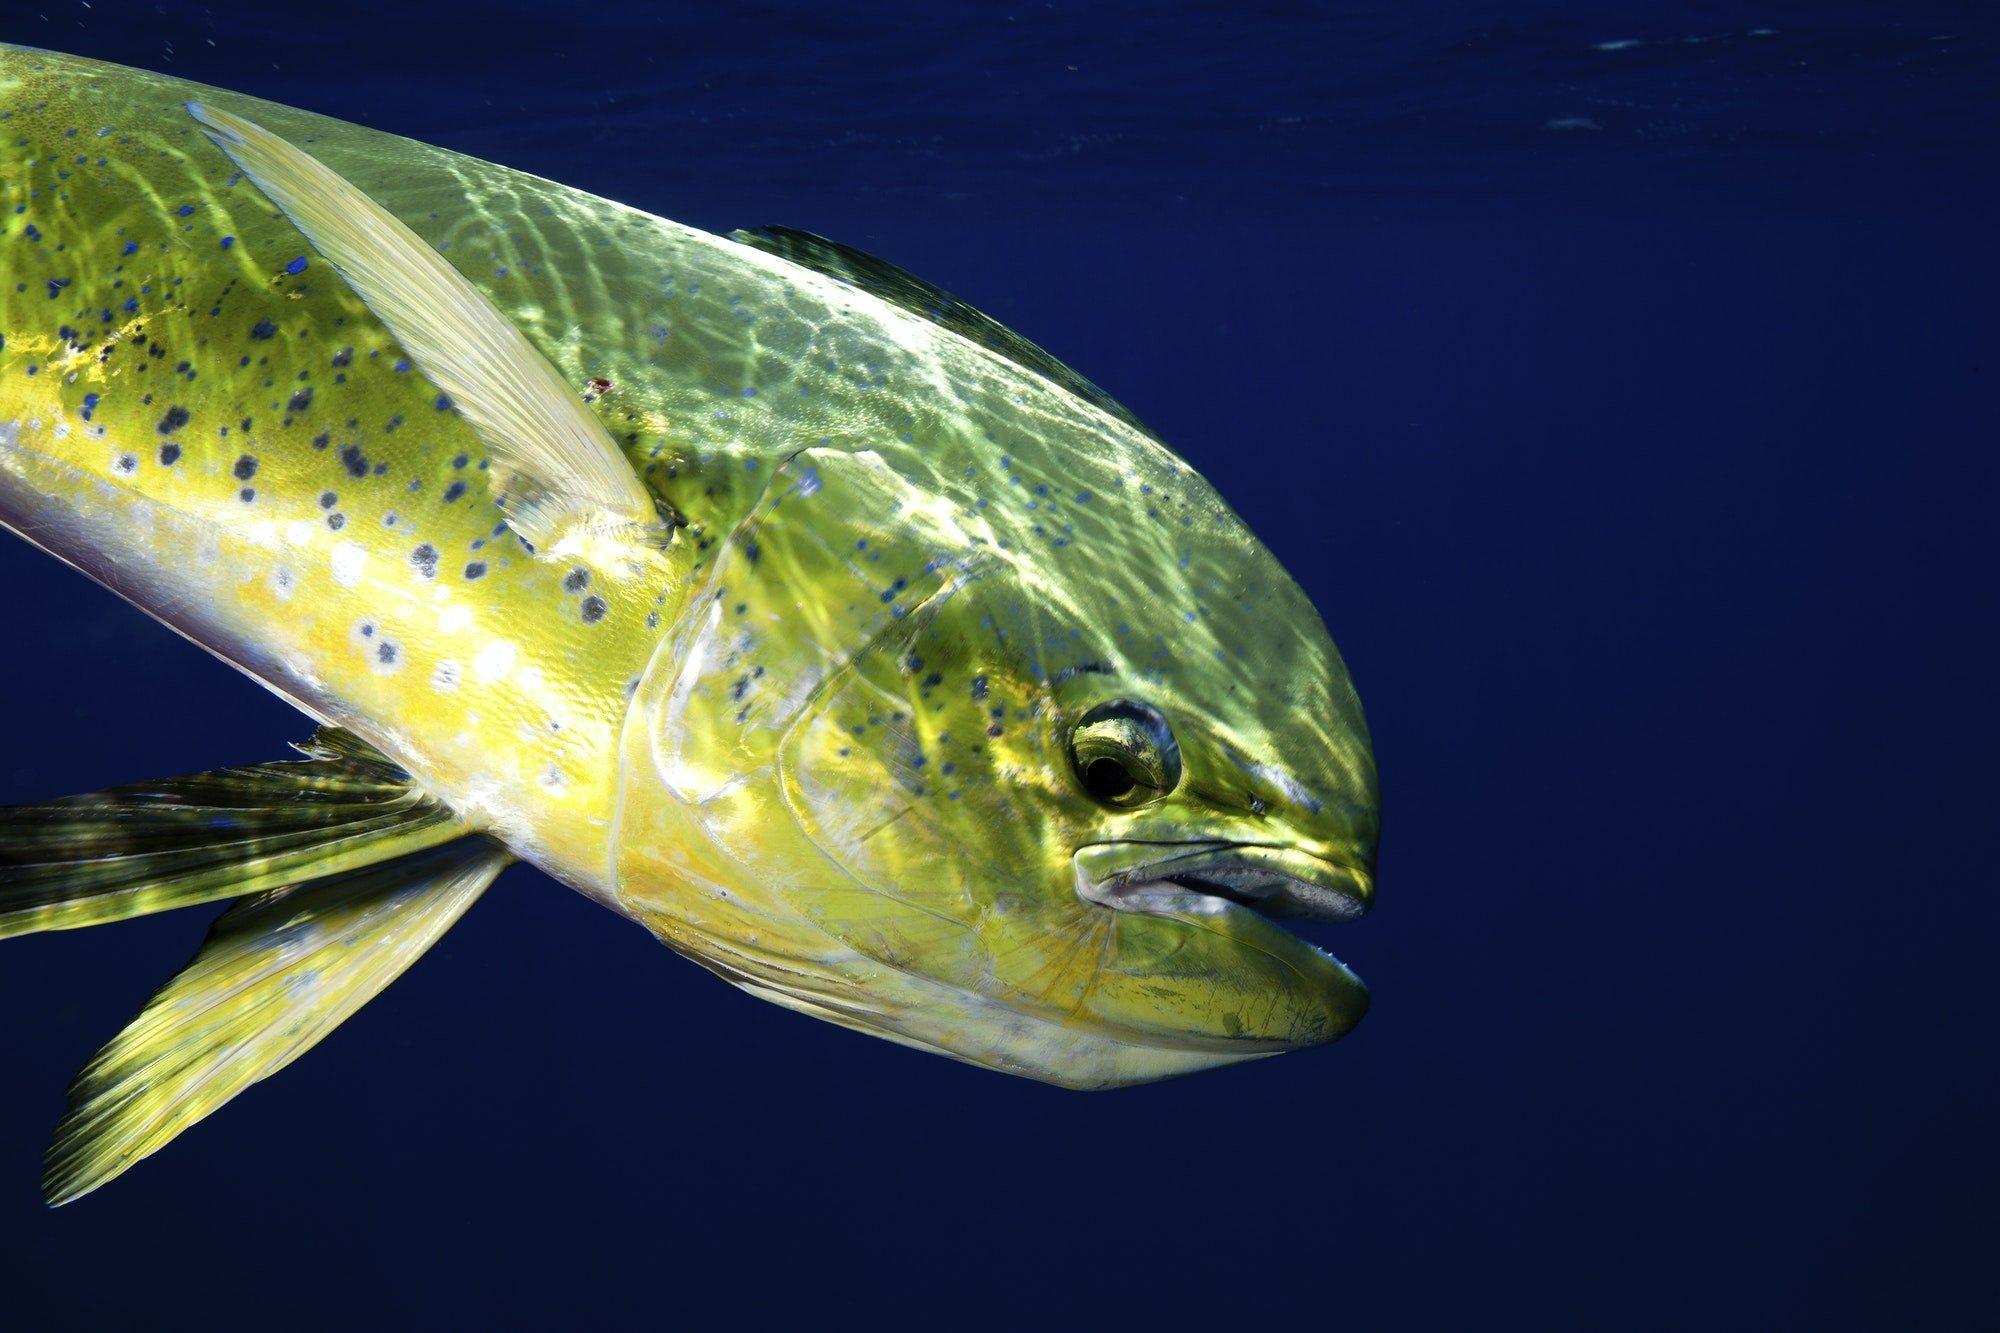 The Gamefish, Coryphaena hippurus or dolphin fish, close up.